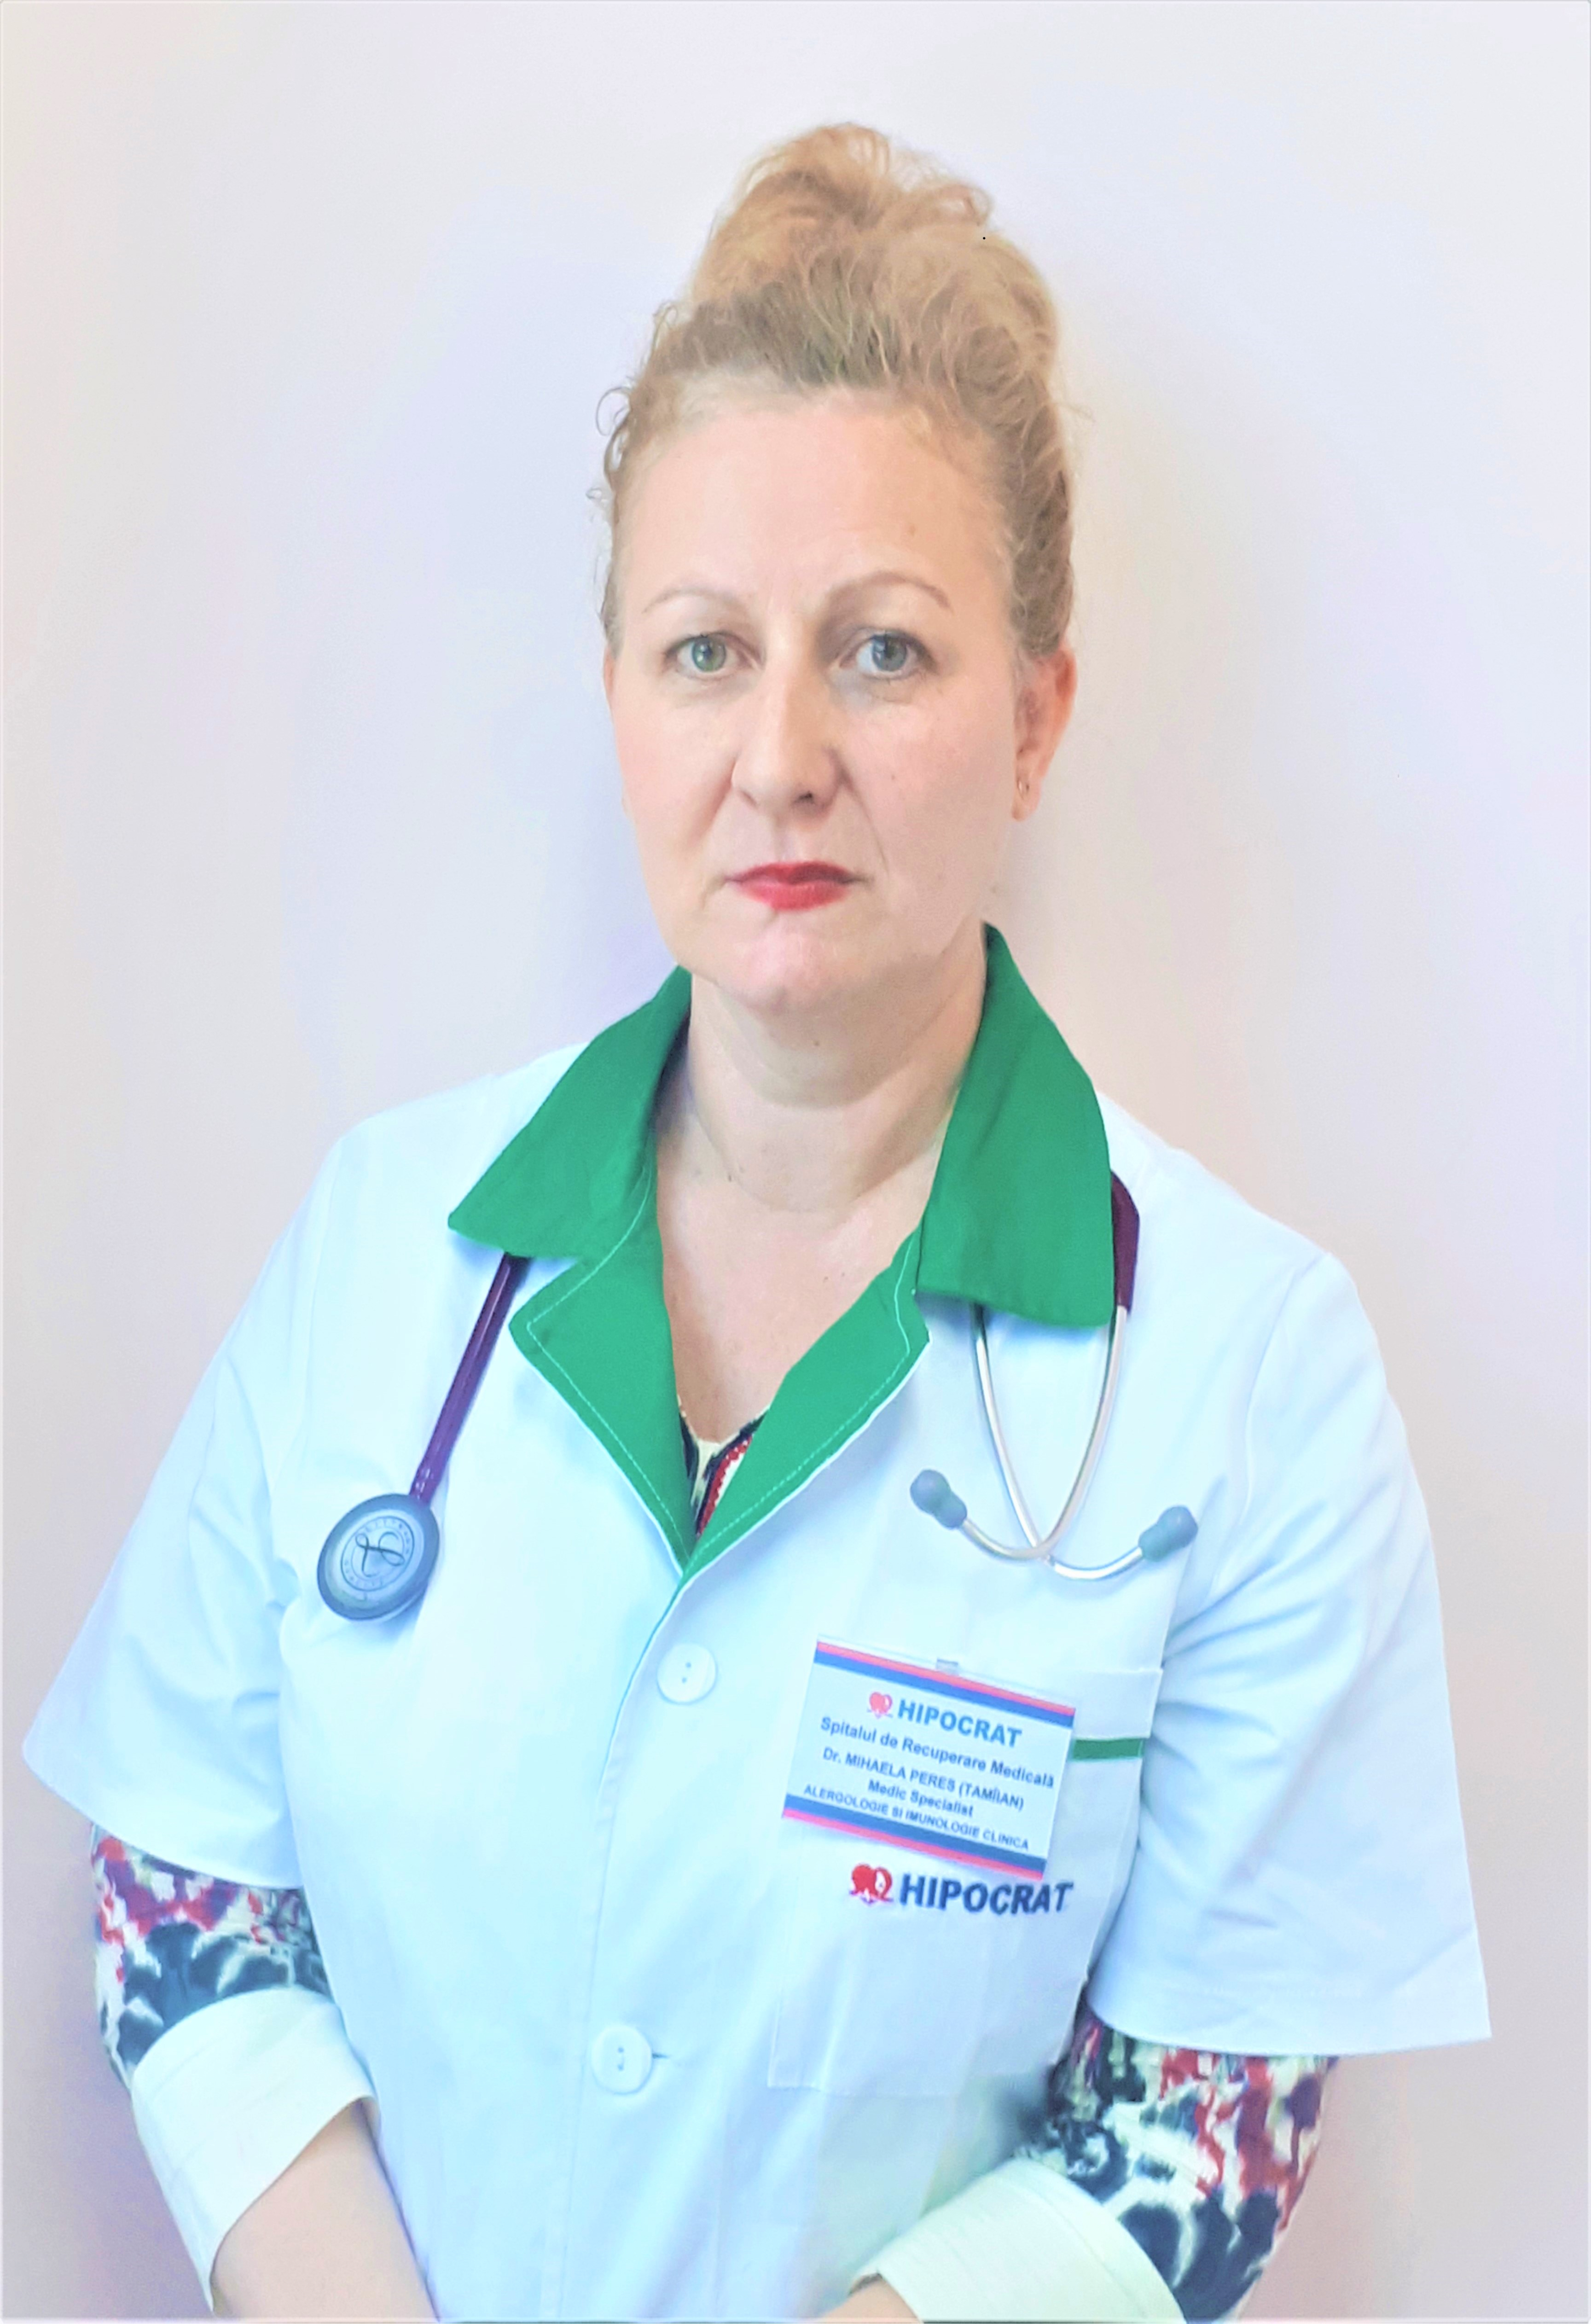 Dr. Mihaela Peres